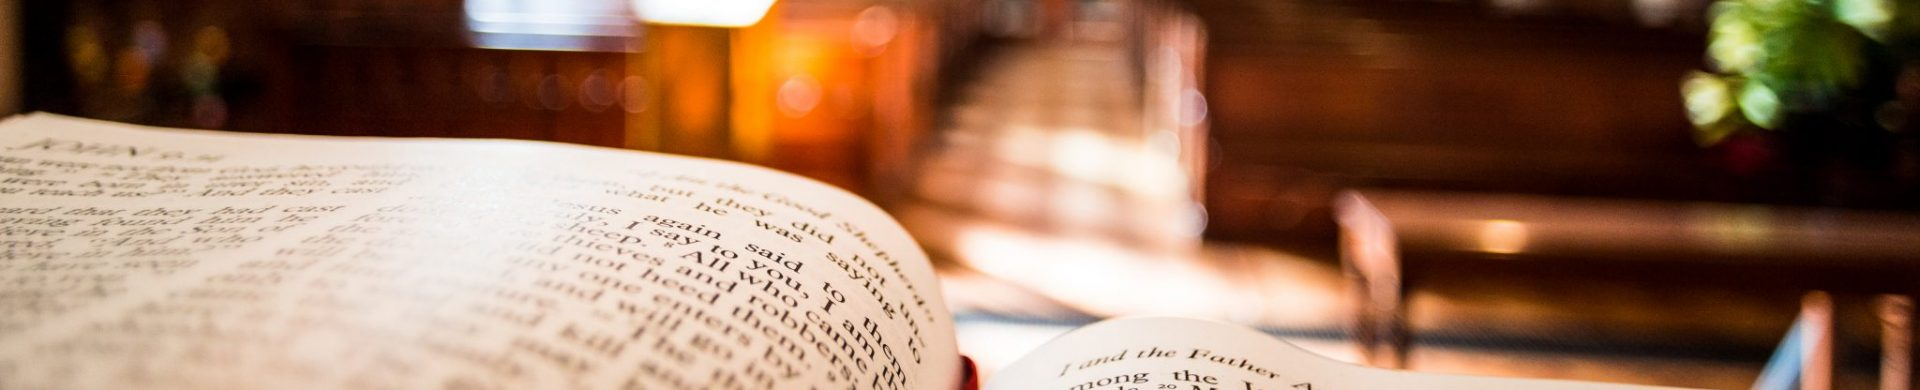 Open bible on altar inside church